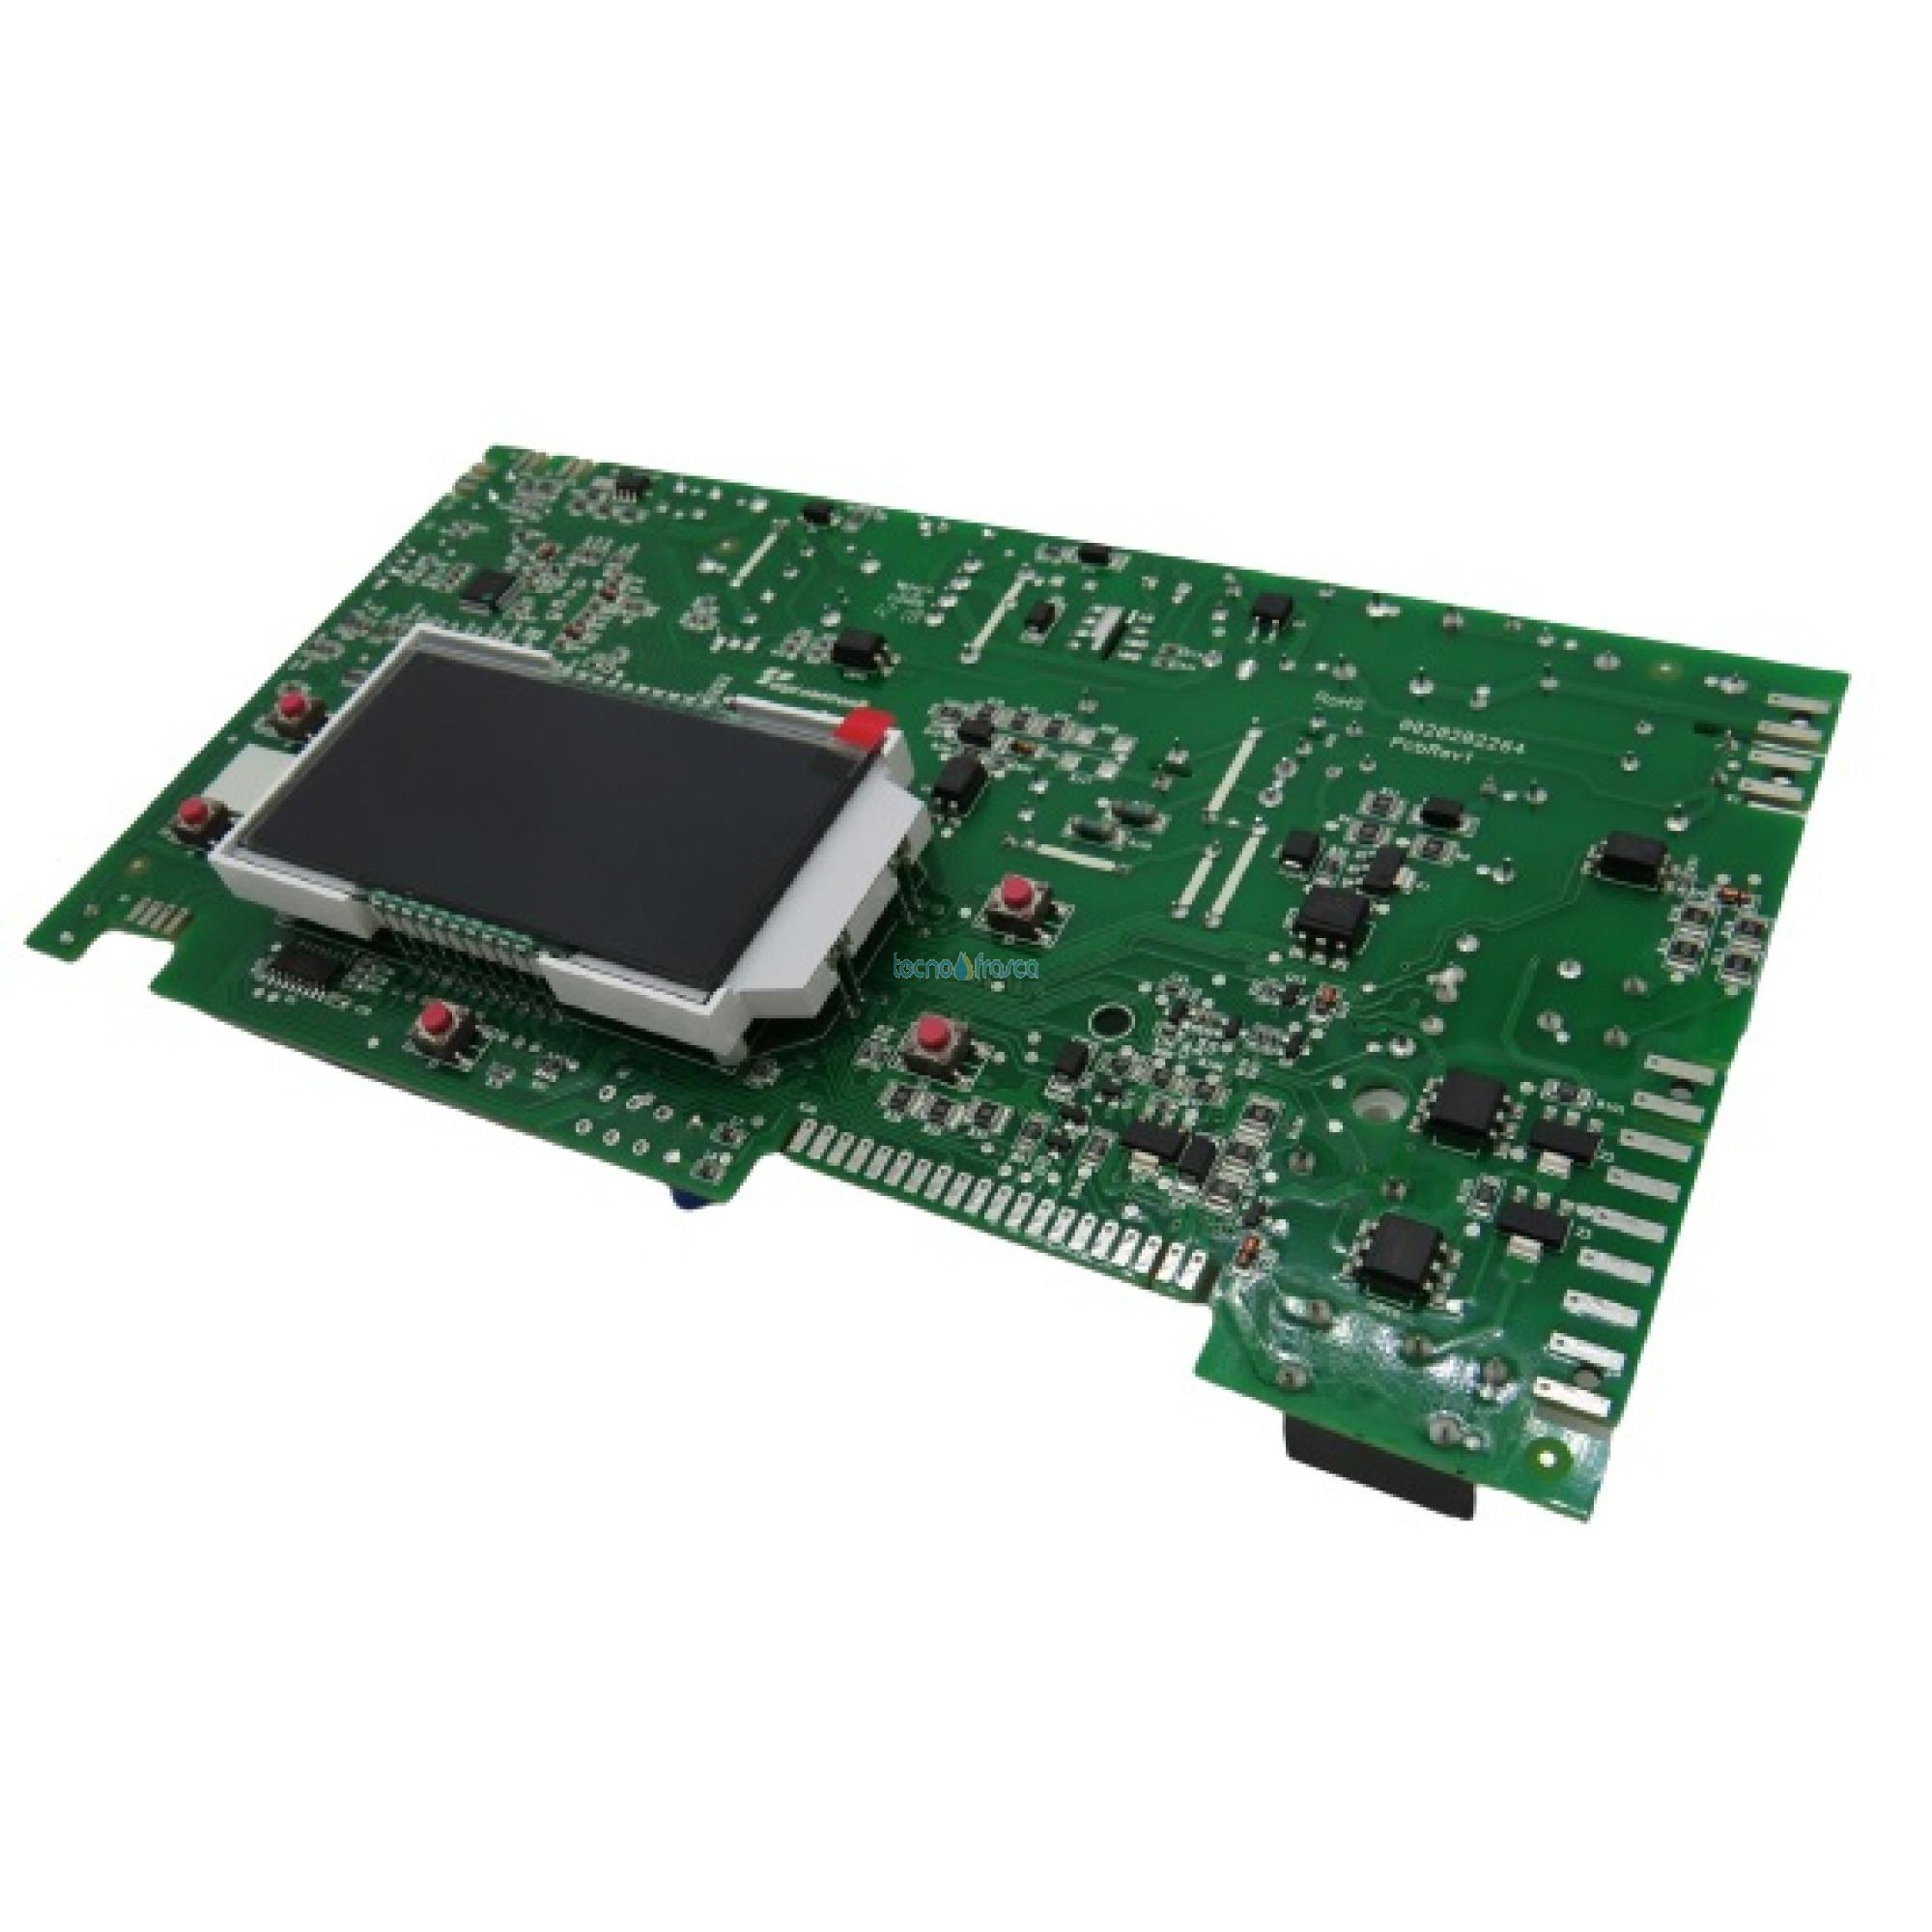 Saunier duval scheda elettronica nitron plus themis 0020123142